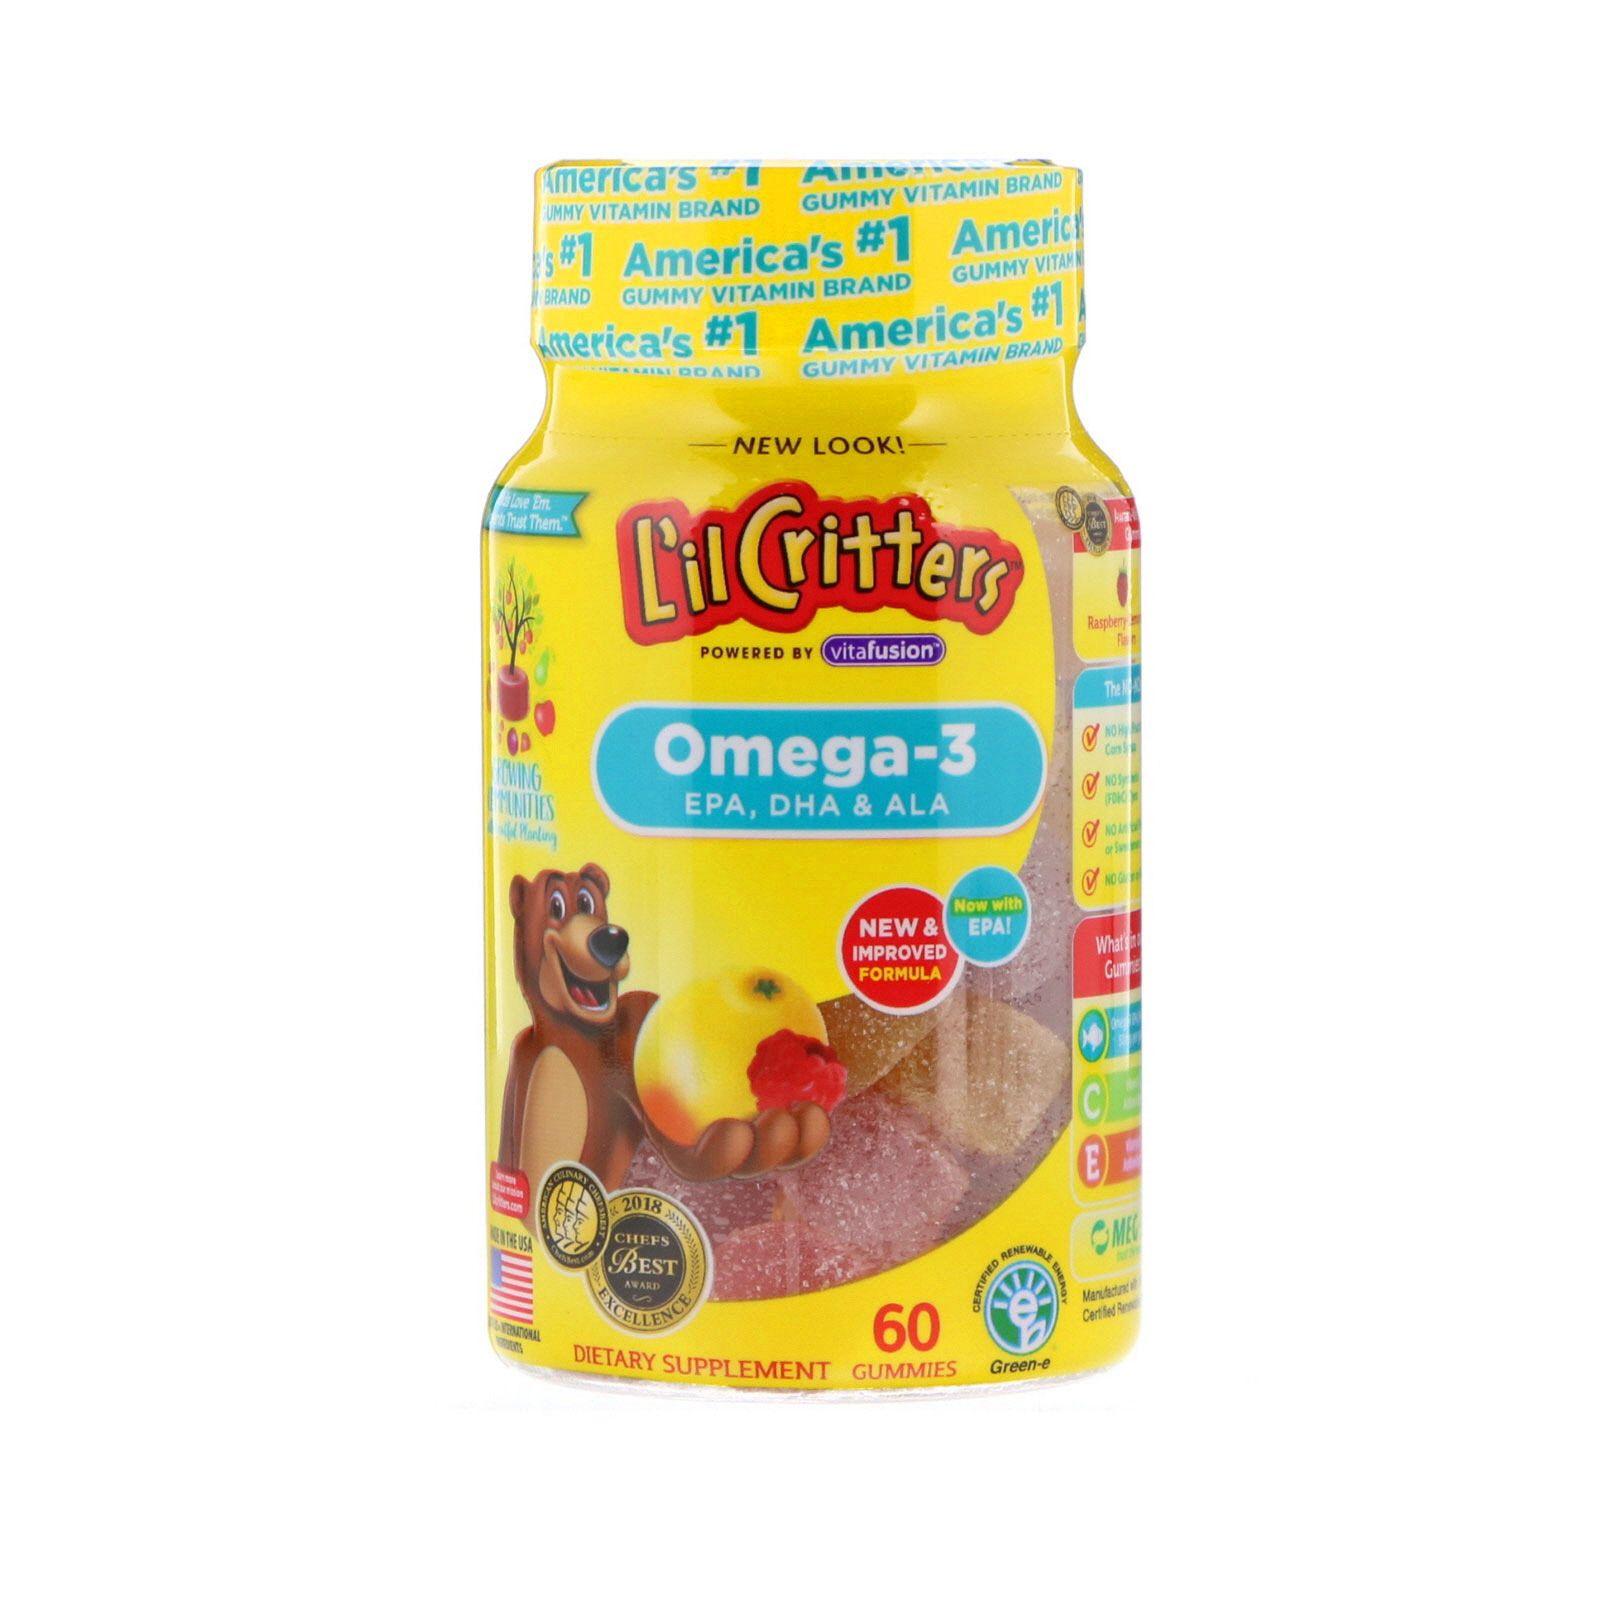 L Il Critters أوميغا 3 نكهات التوت والليمون 60 علكة Raspberry Lemonade Gummies Gummy Vitamins